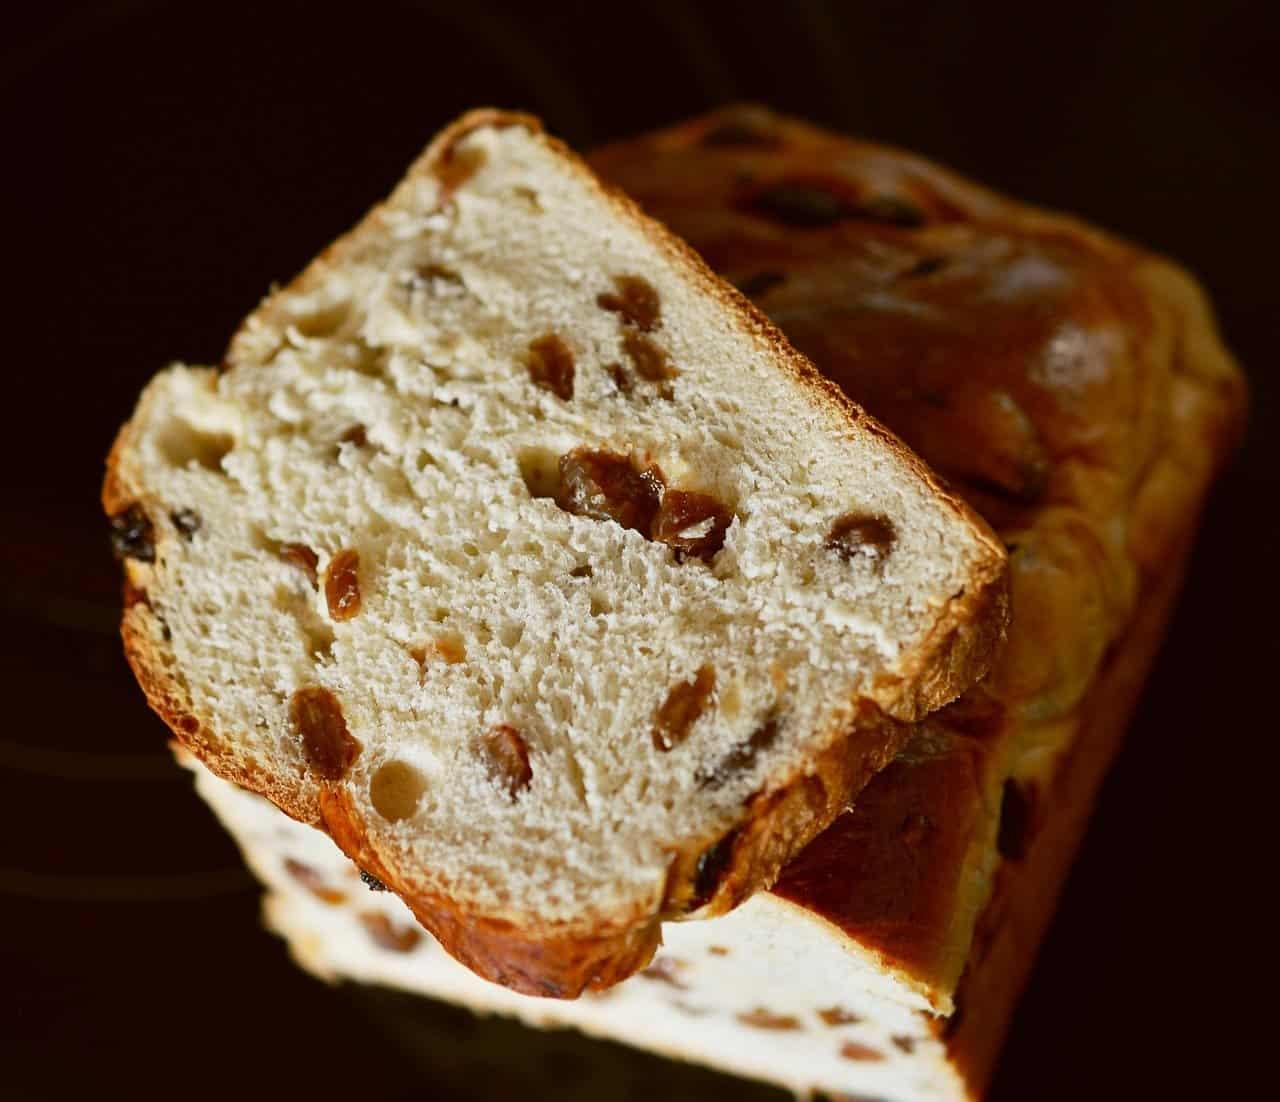 Raisin bread slice